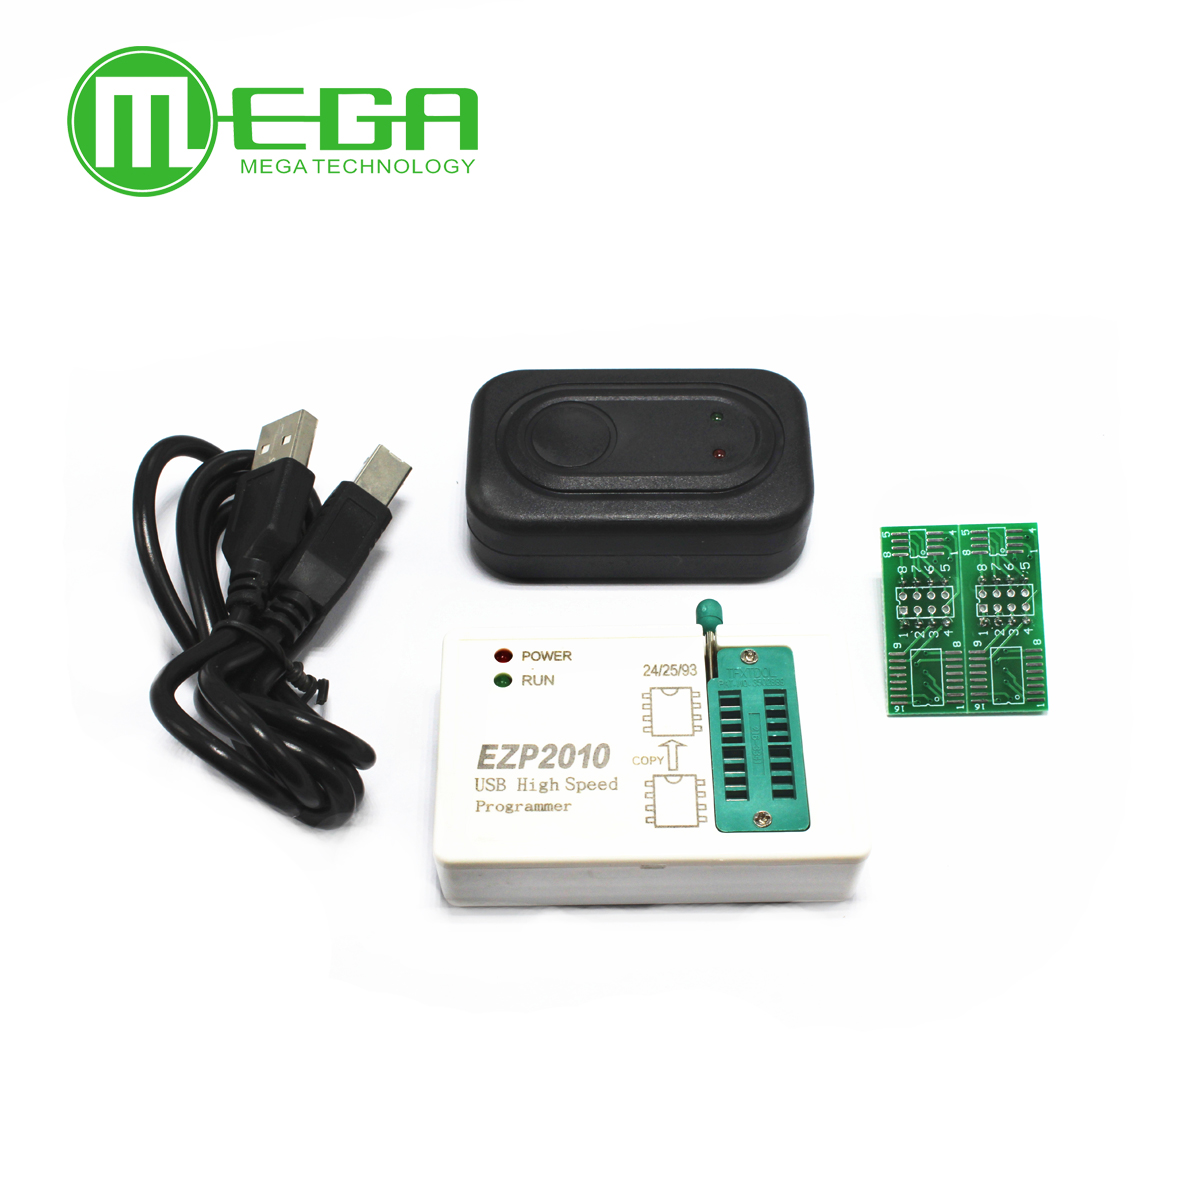 EZP2010 alta velocidad del USB SPI Programmer support24 25 93 EEPROM 25 flash bios chip